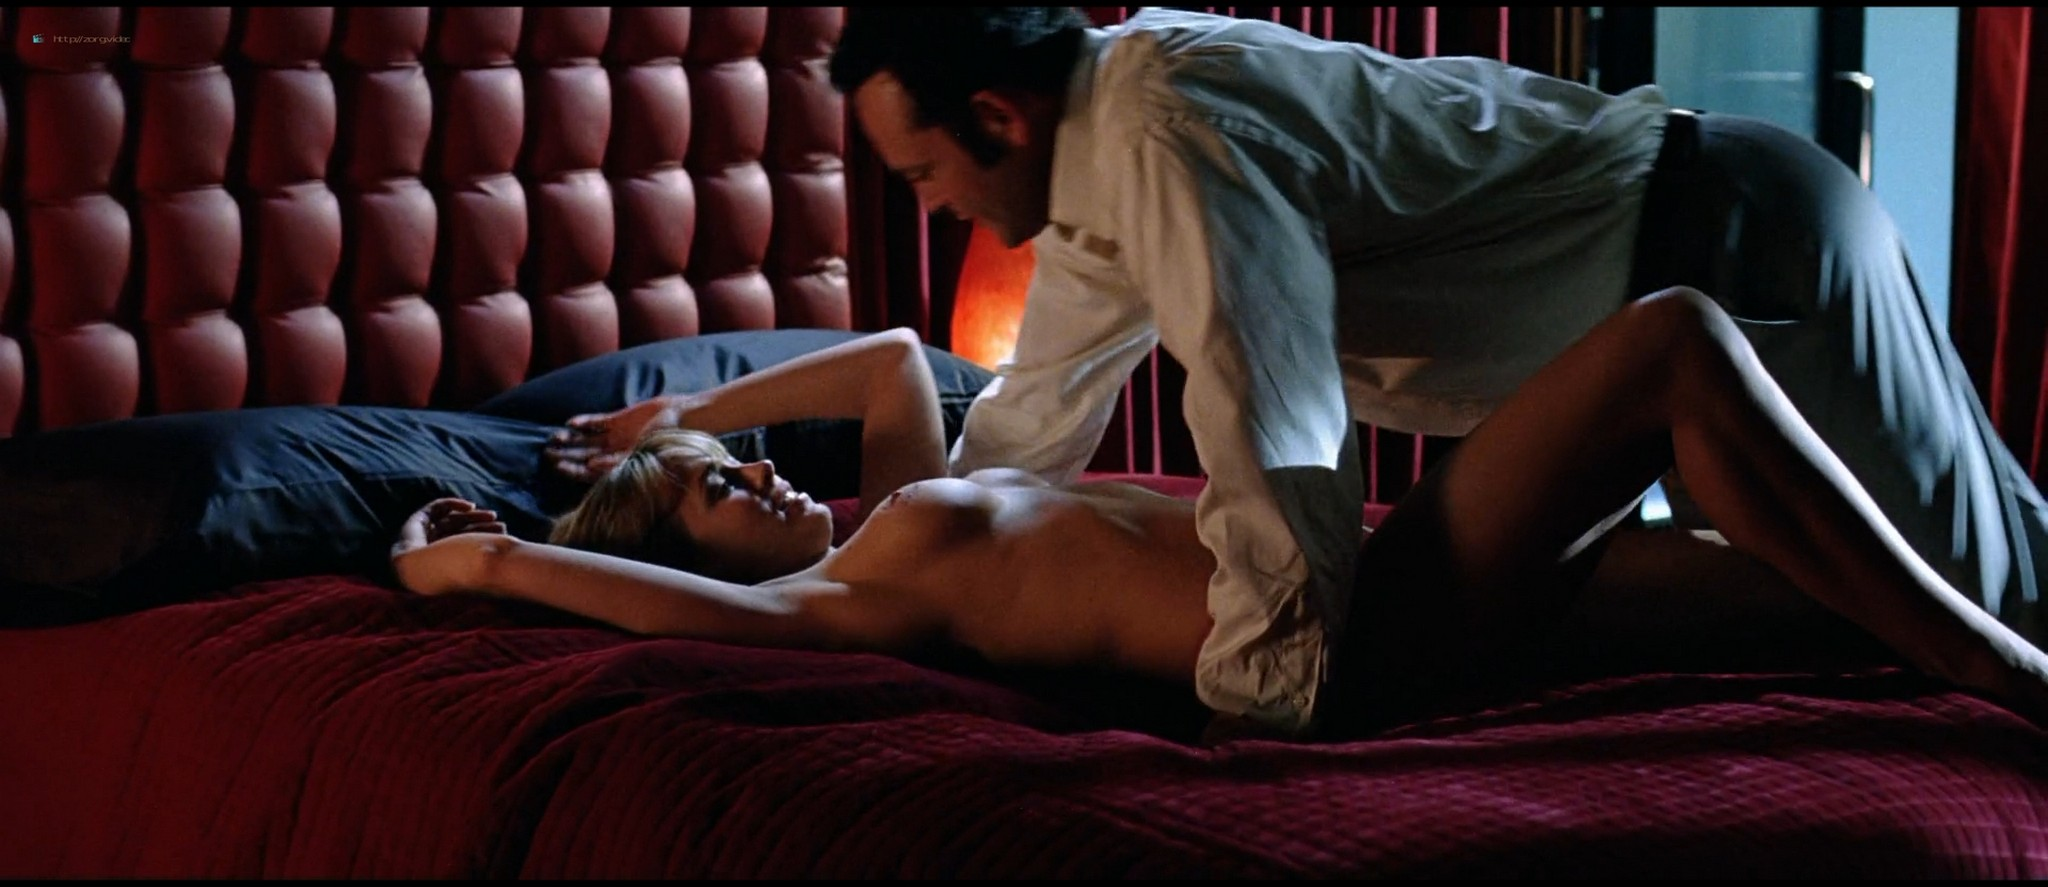 Diora Baird nude topless huge boobs others nude too - Wedding Crashers (2005) HD 1080p BluRay (11)